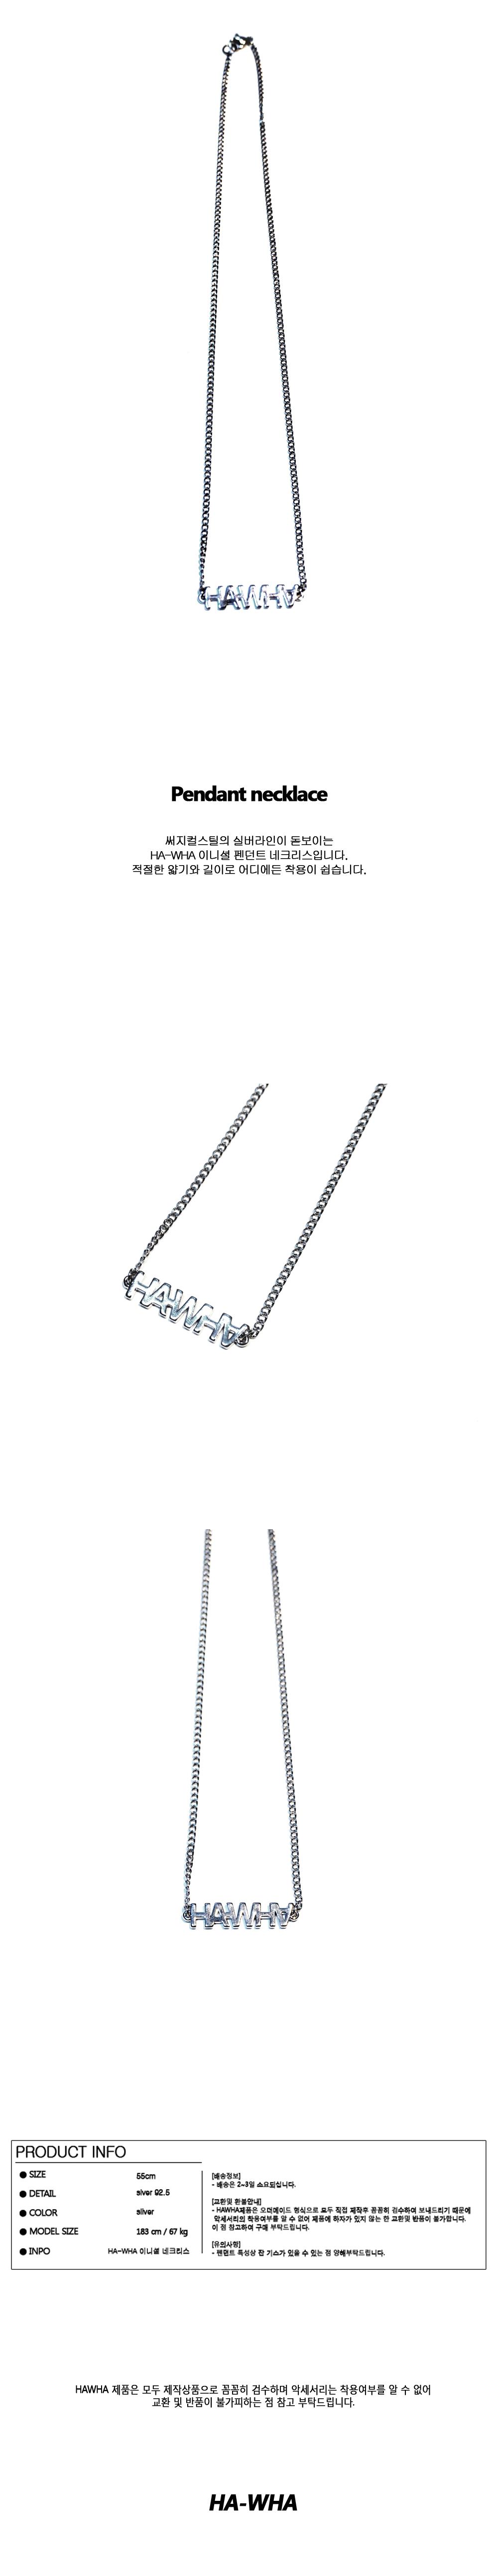 Pendant necklace.jpg